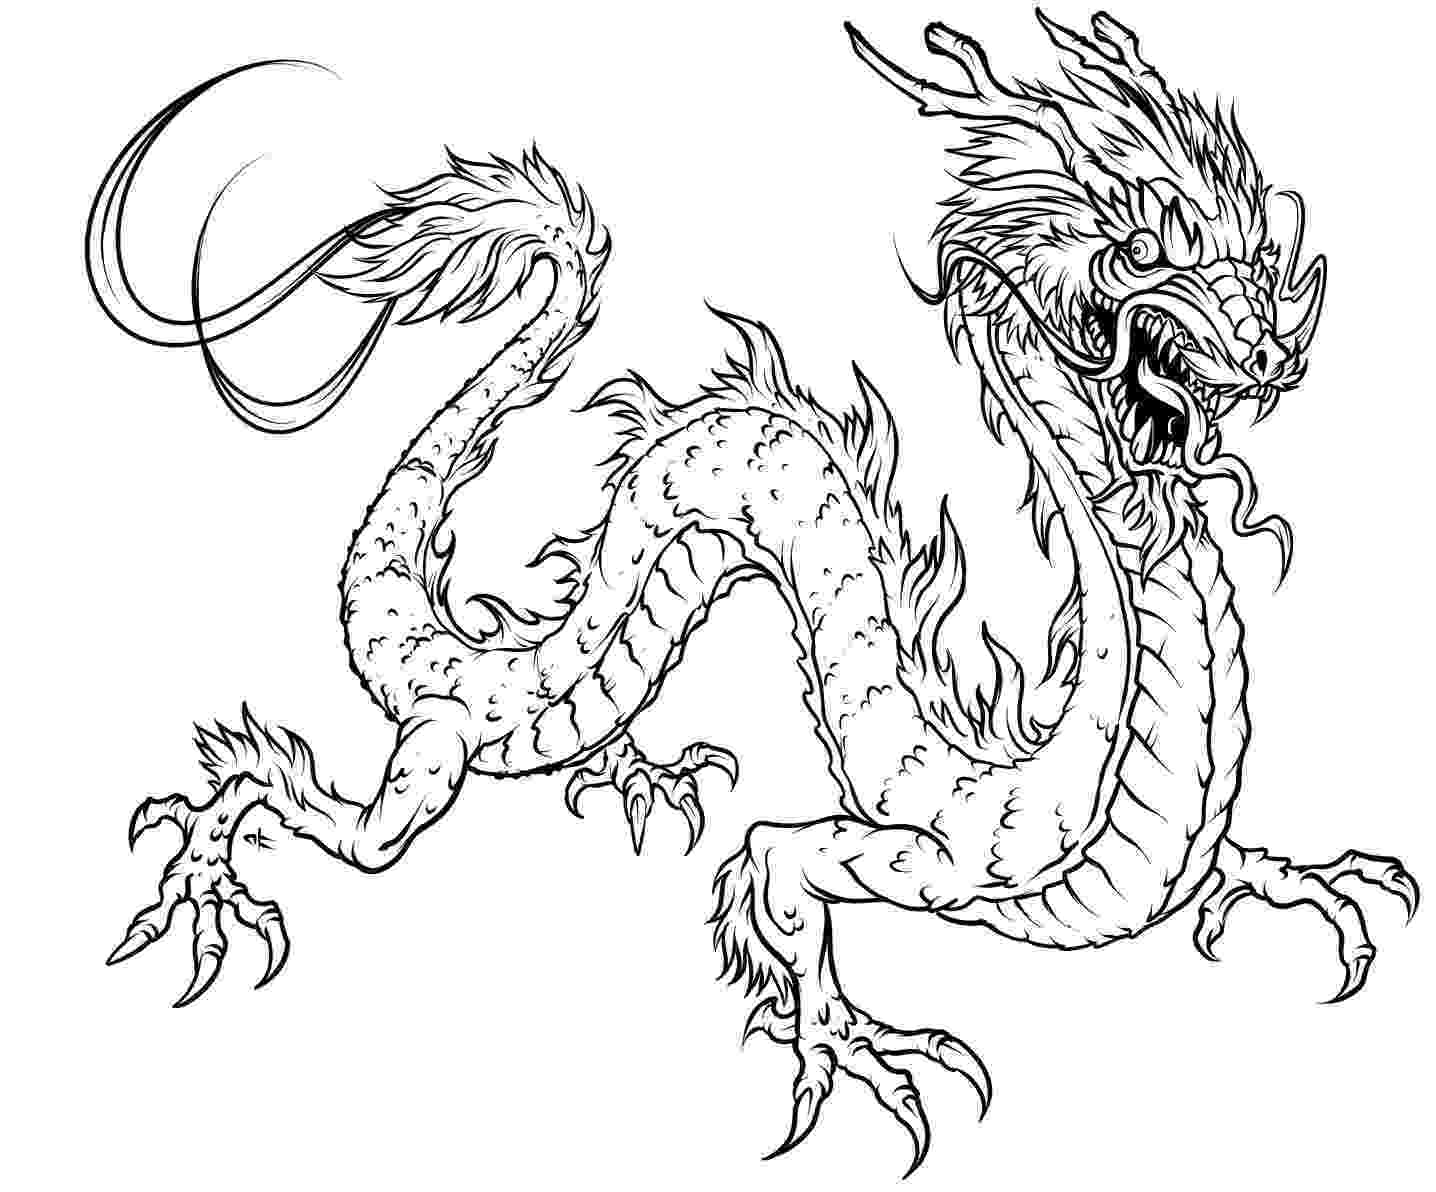 coloring page dragon printable dragon coloring pages for kids cool2bkids coloring dragon page